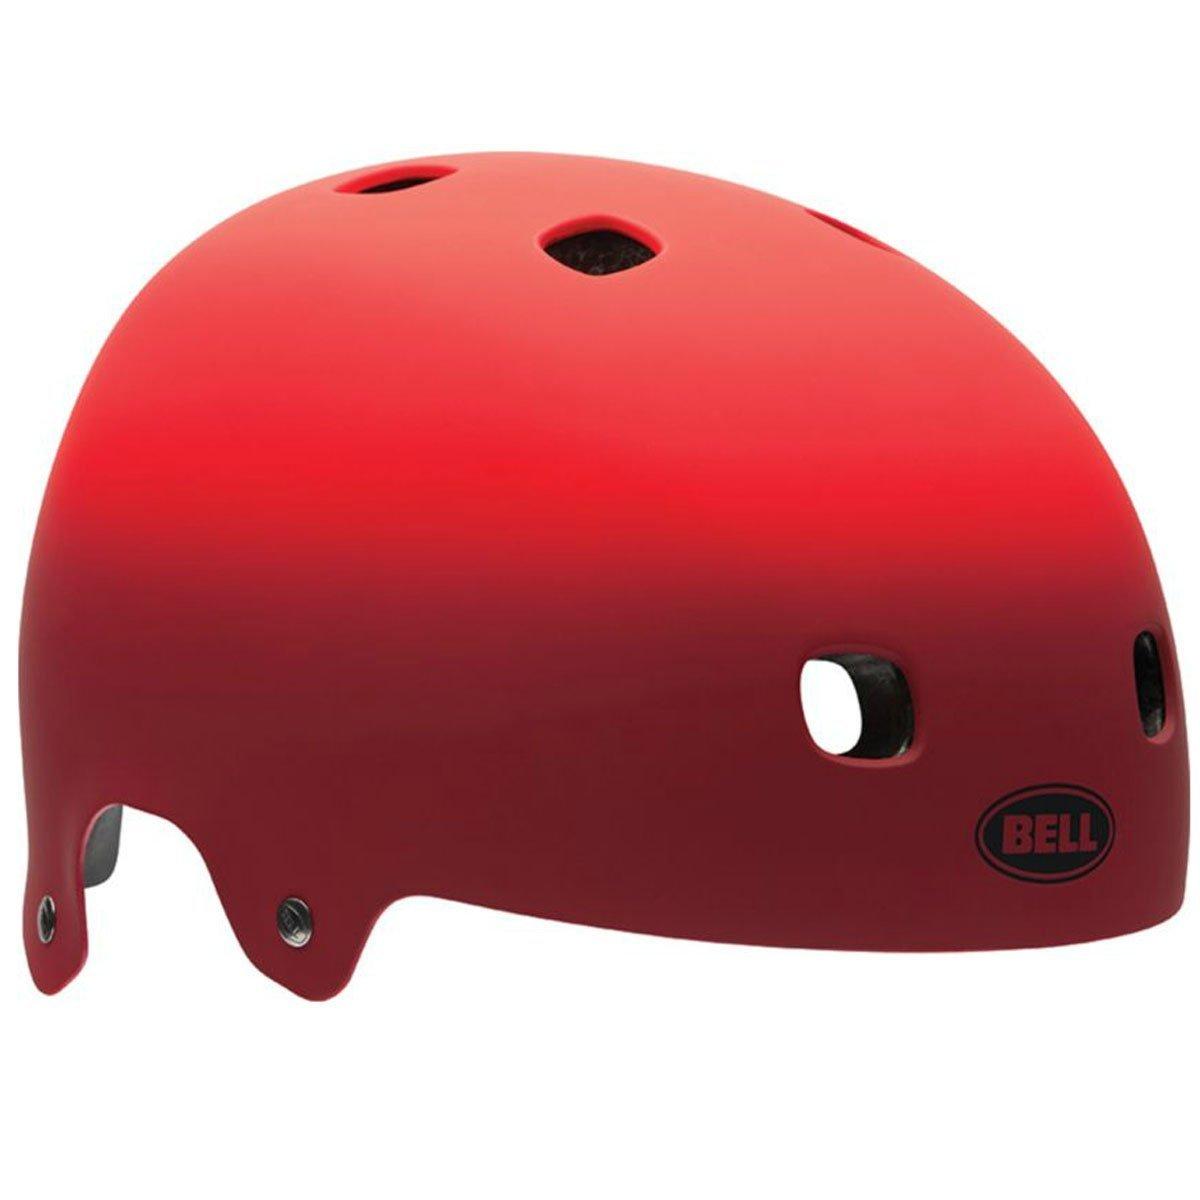 Bell Segment Multi-Sport Helmet product image